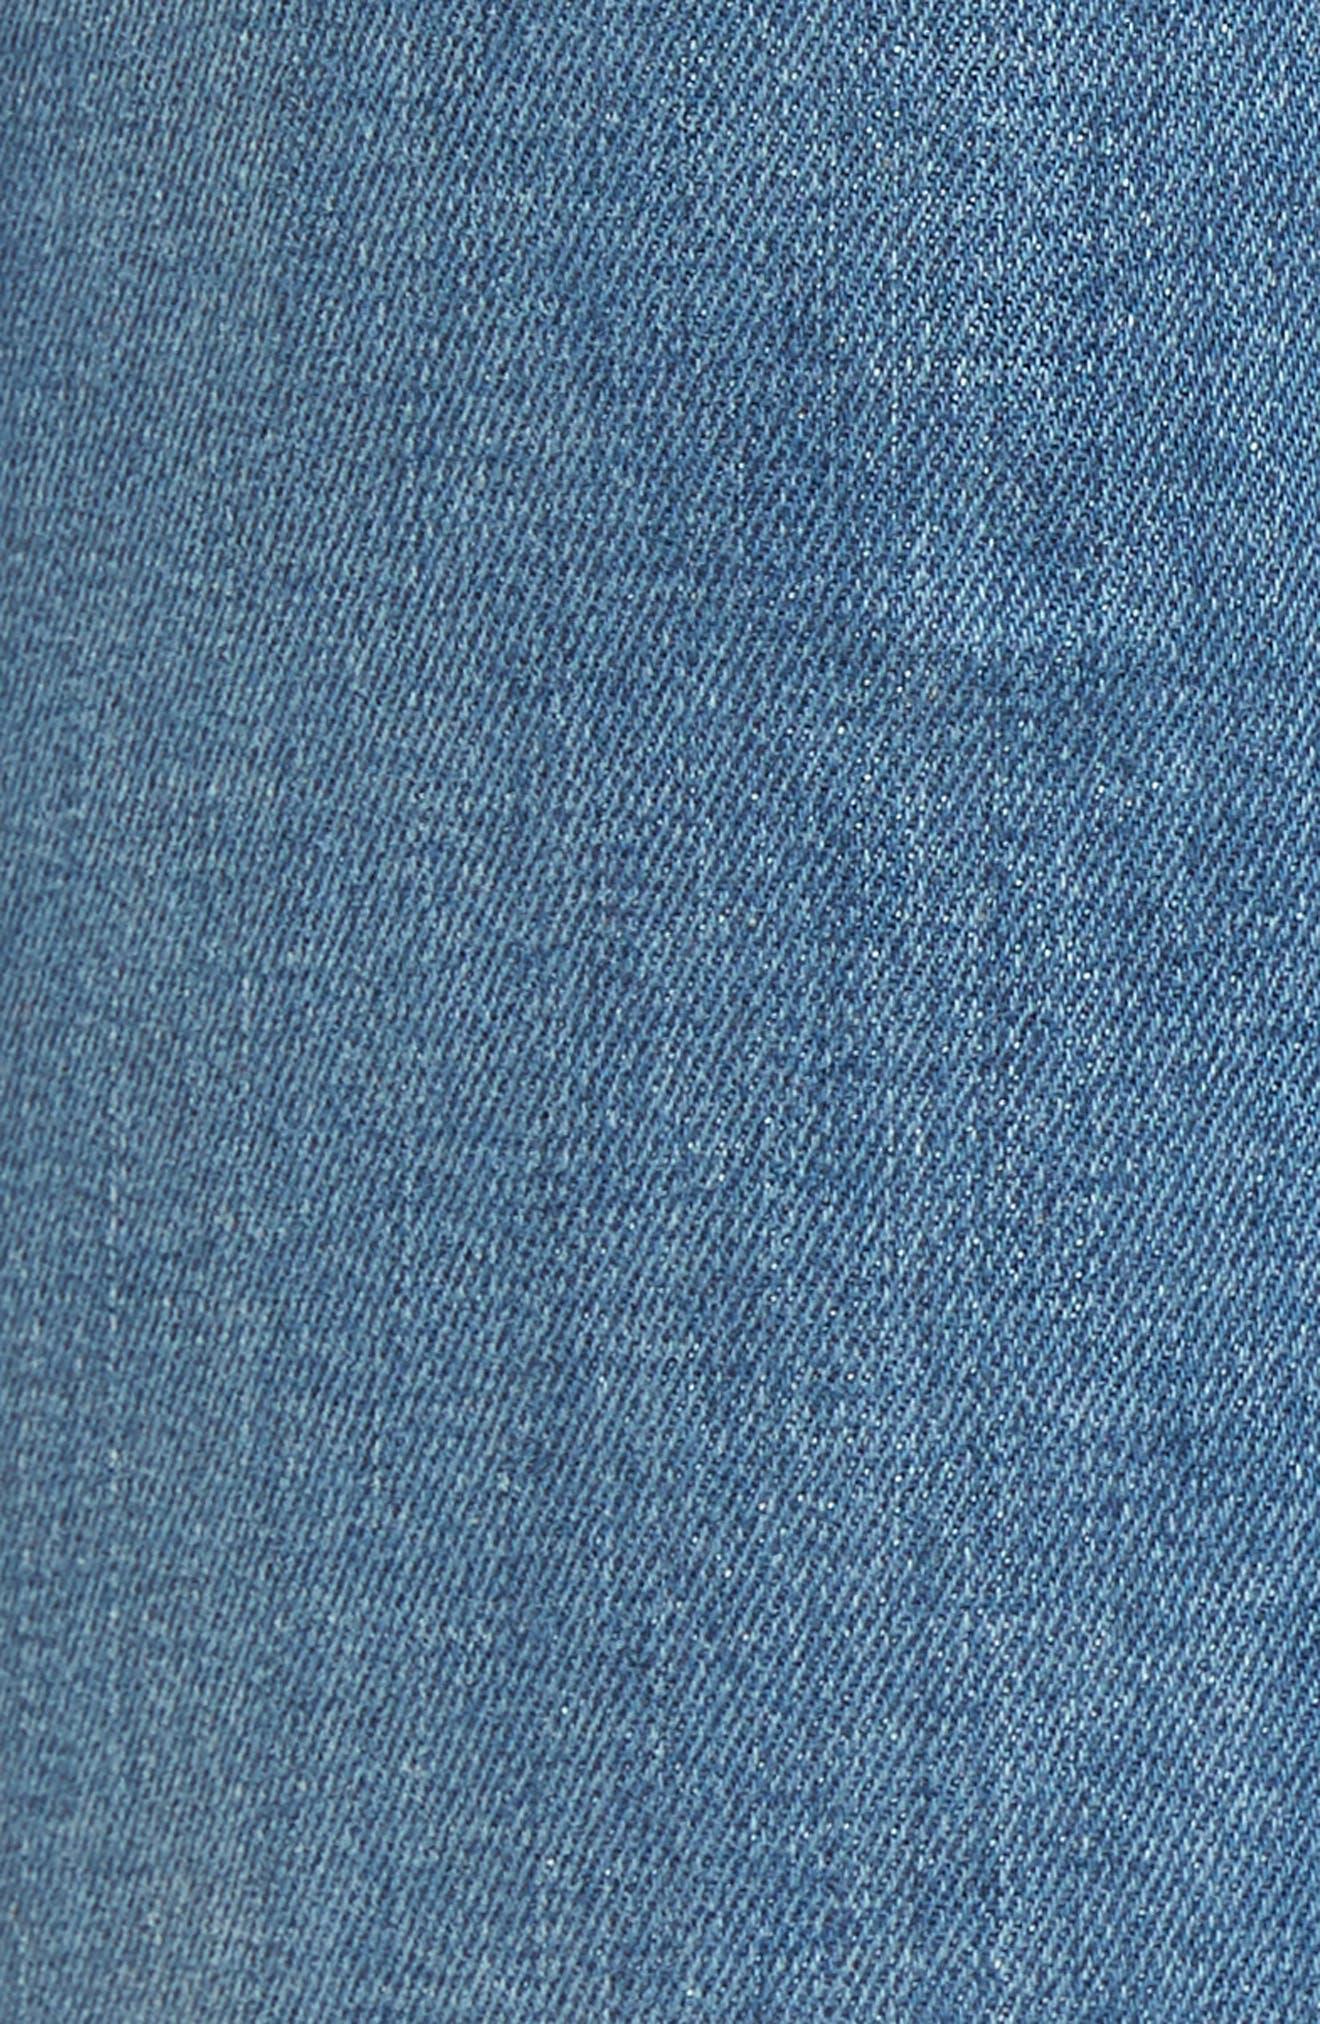 Holly High Waist Raw Hem Crop Wide Leg Jeans,                             Alternate thumbnail 6, color,                             Own It